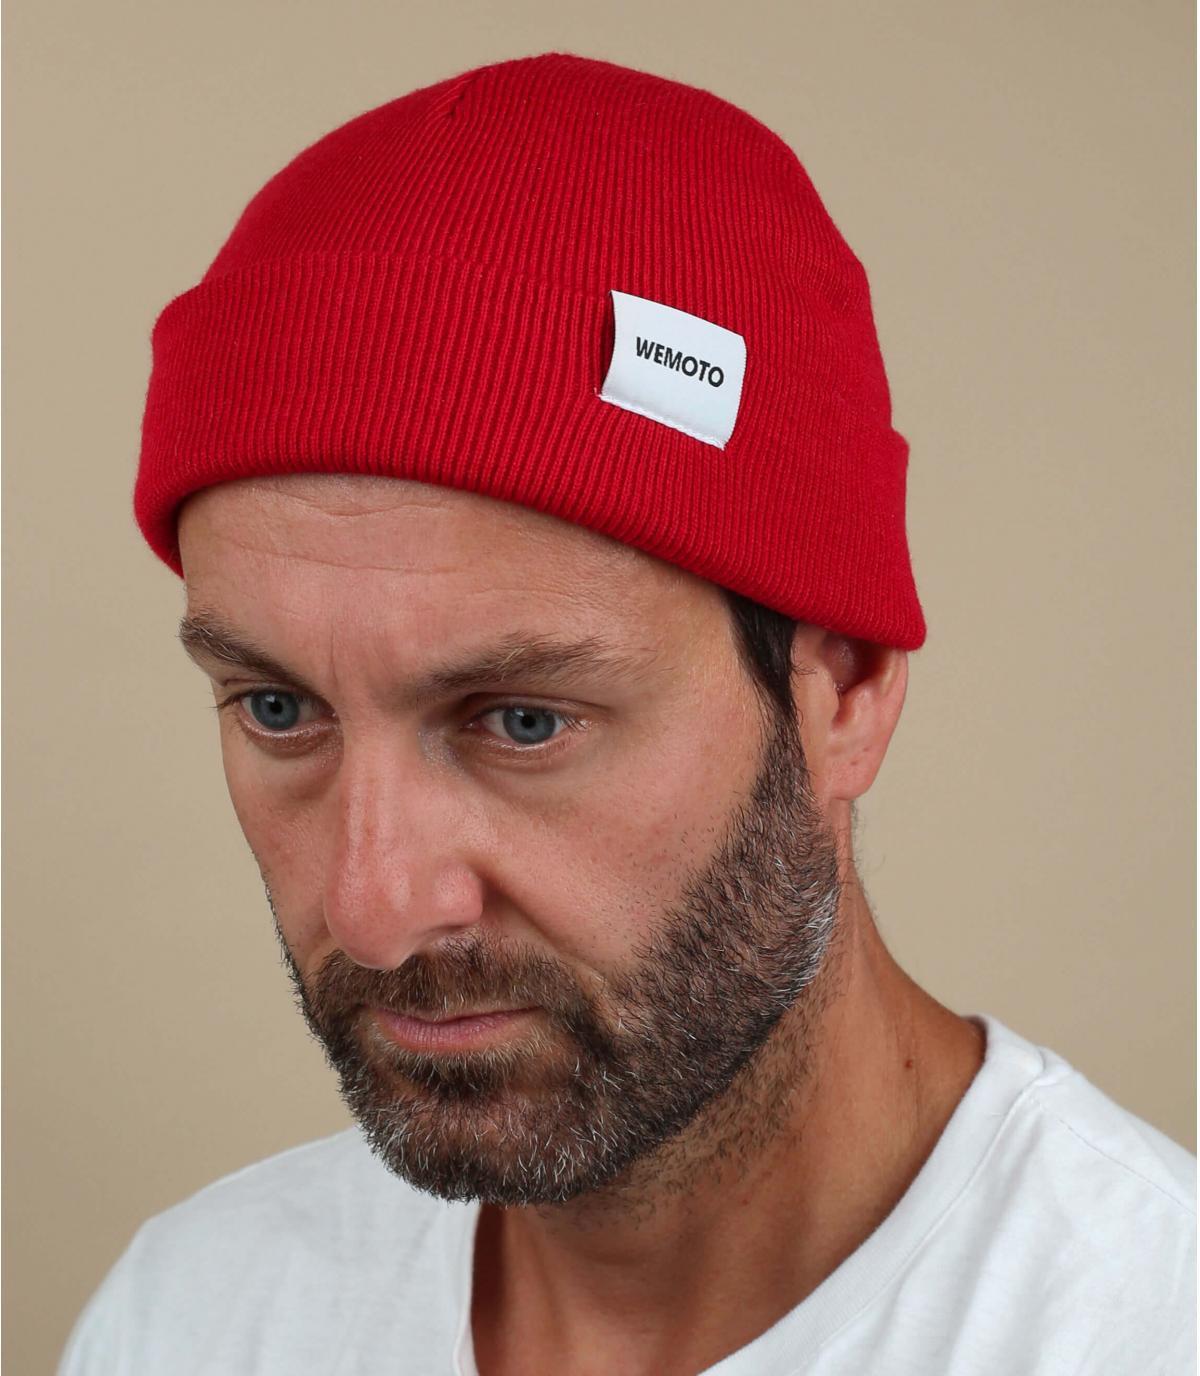 Cappello docker rosso Wemoto